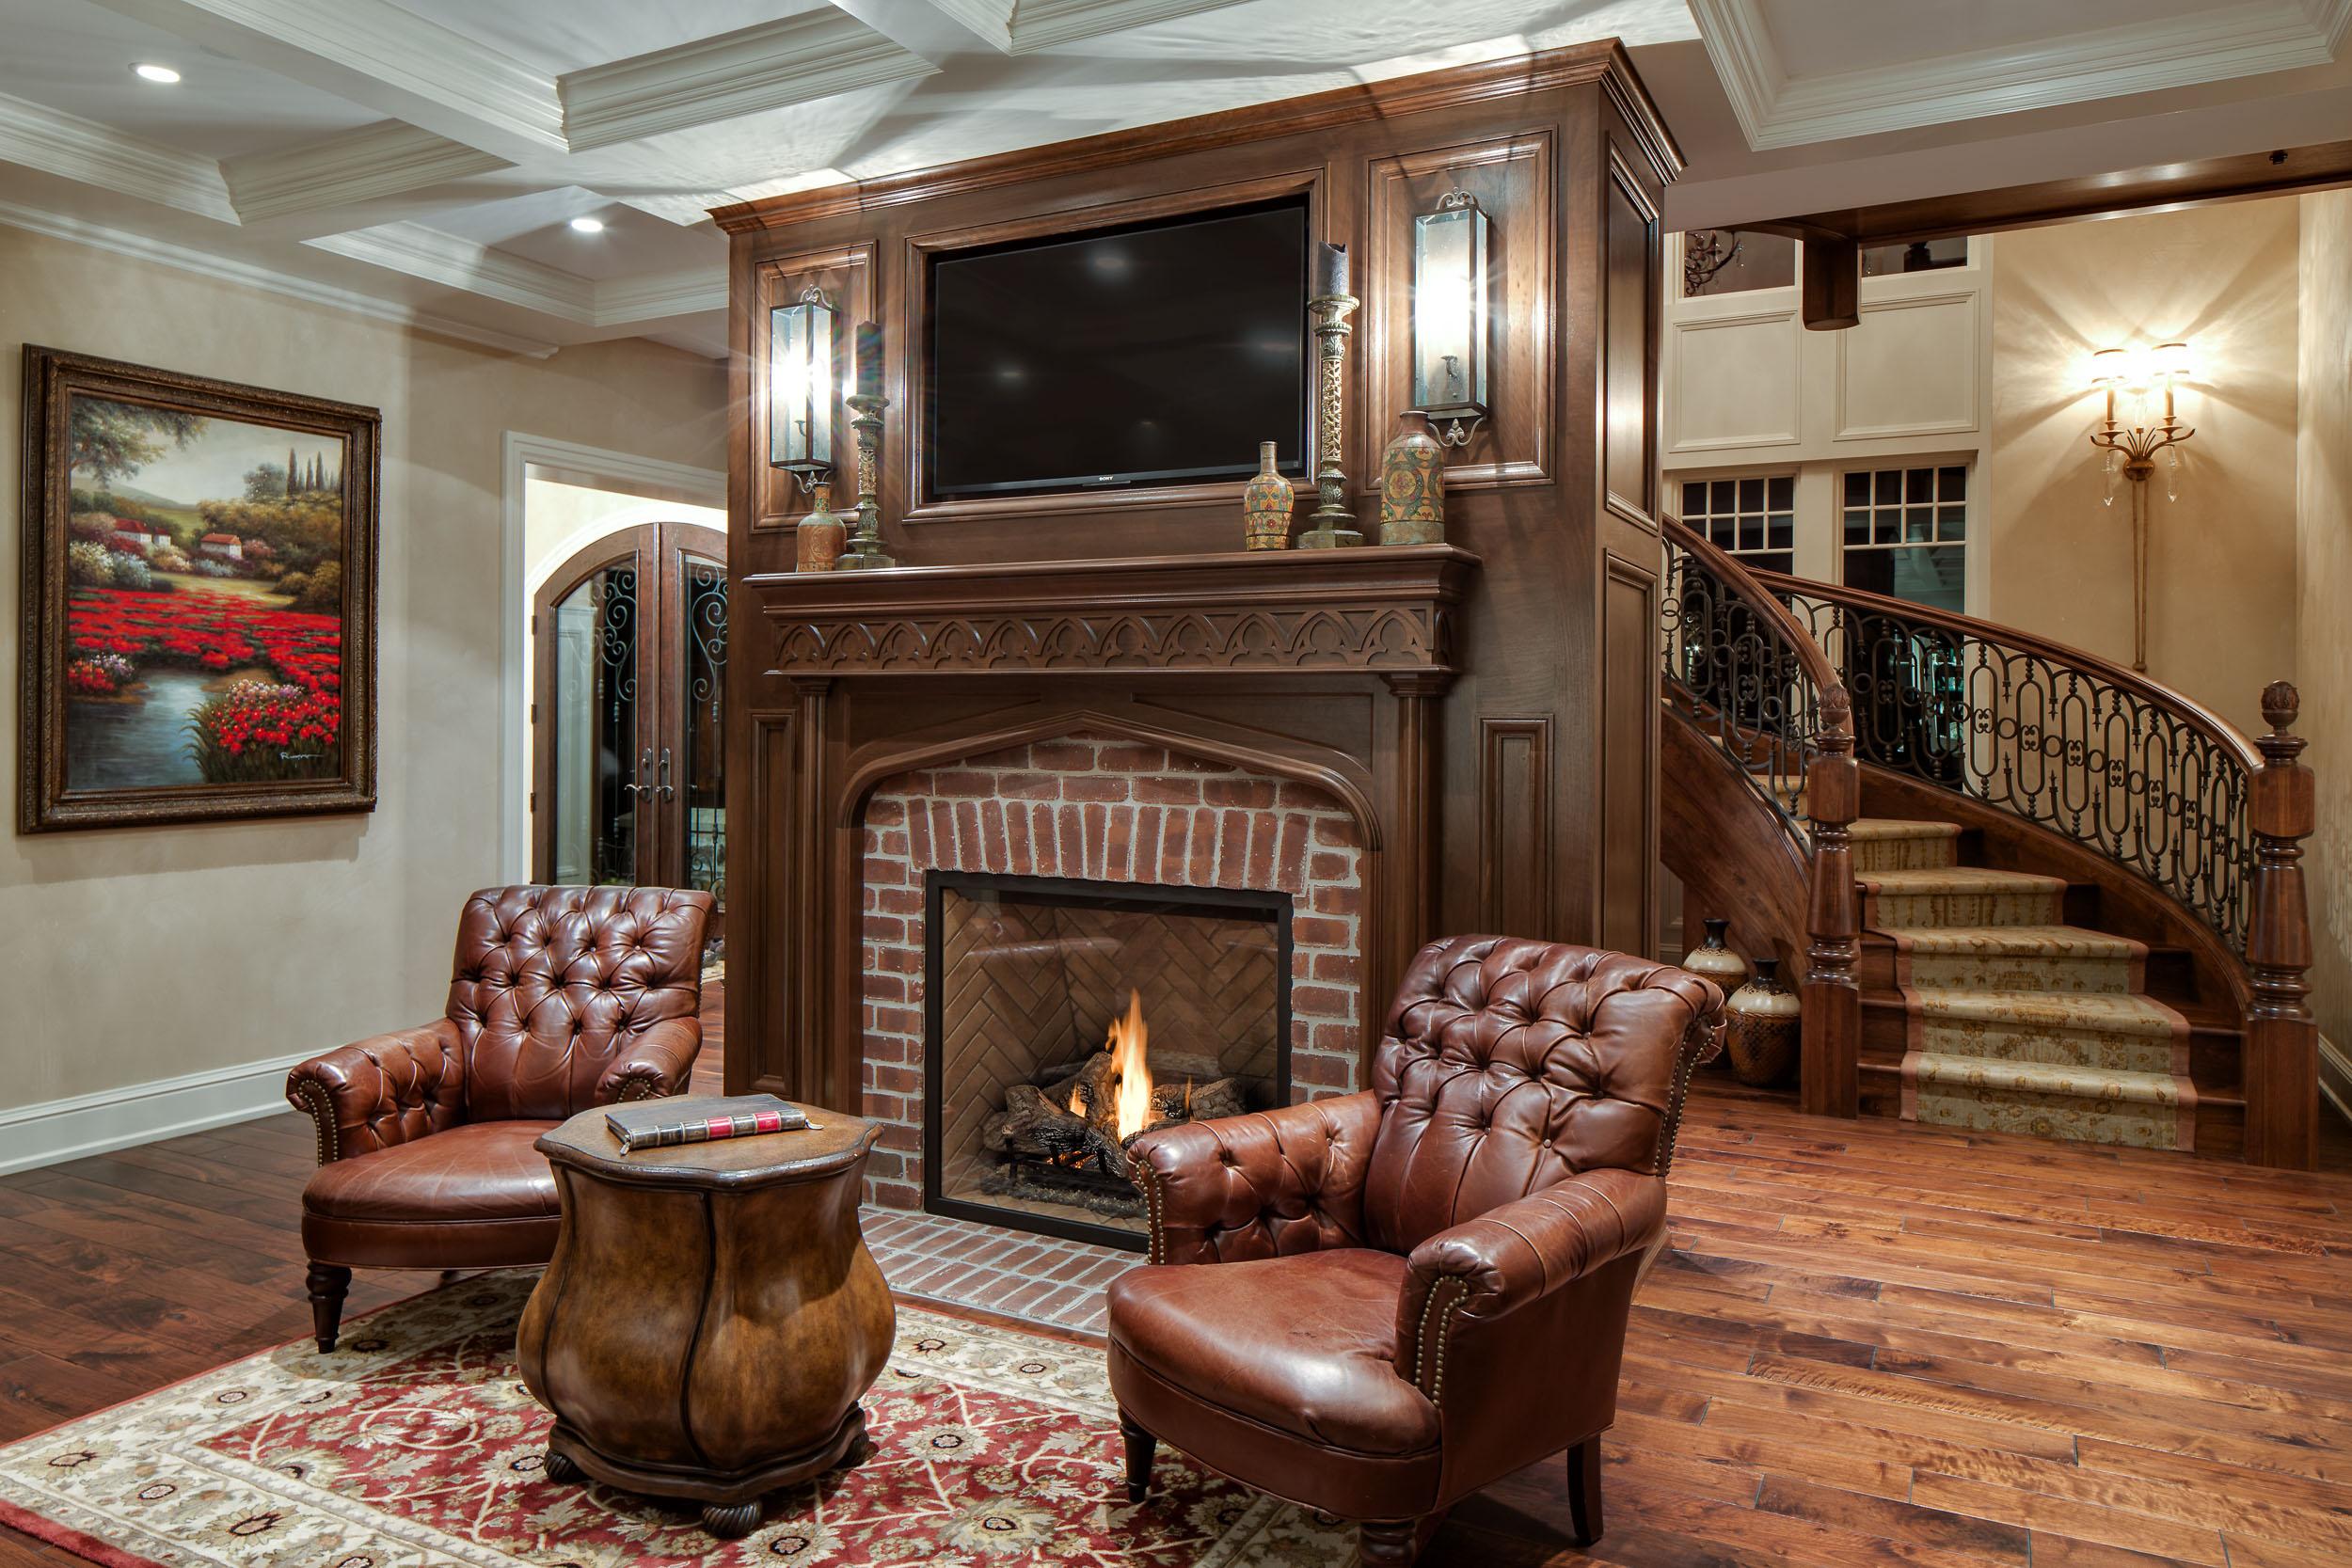 Lake Home Fireplace Image